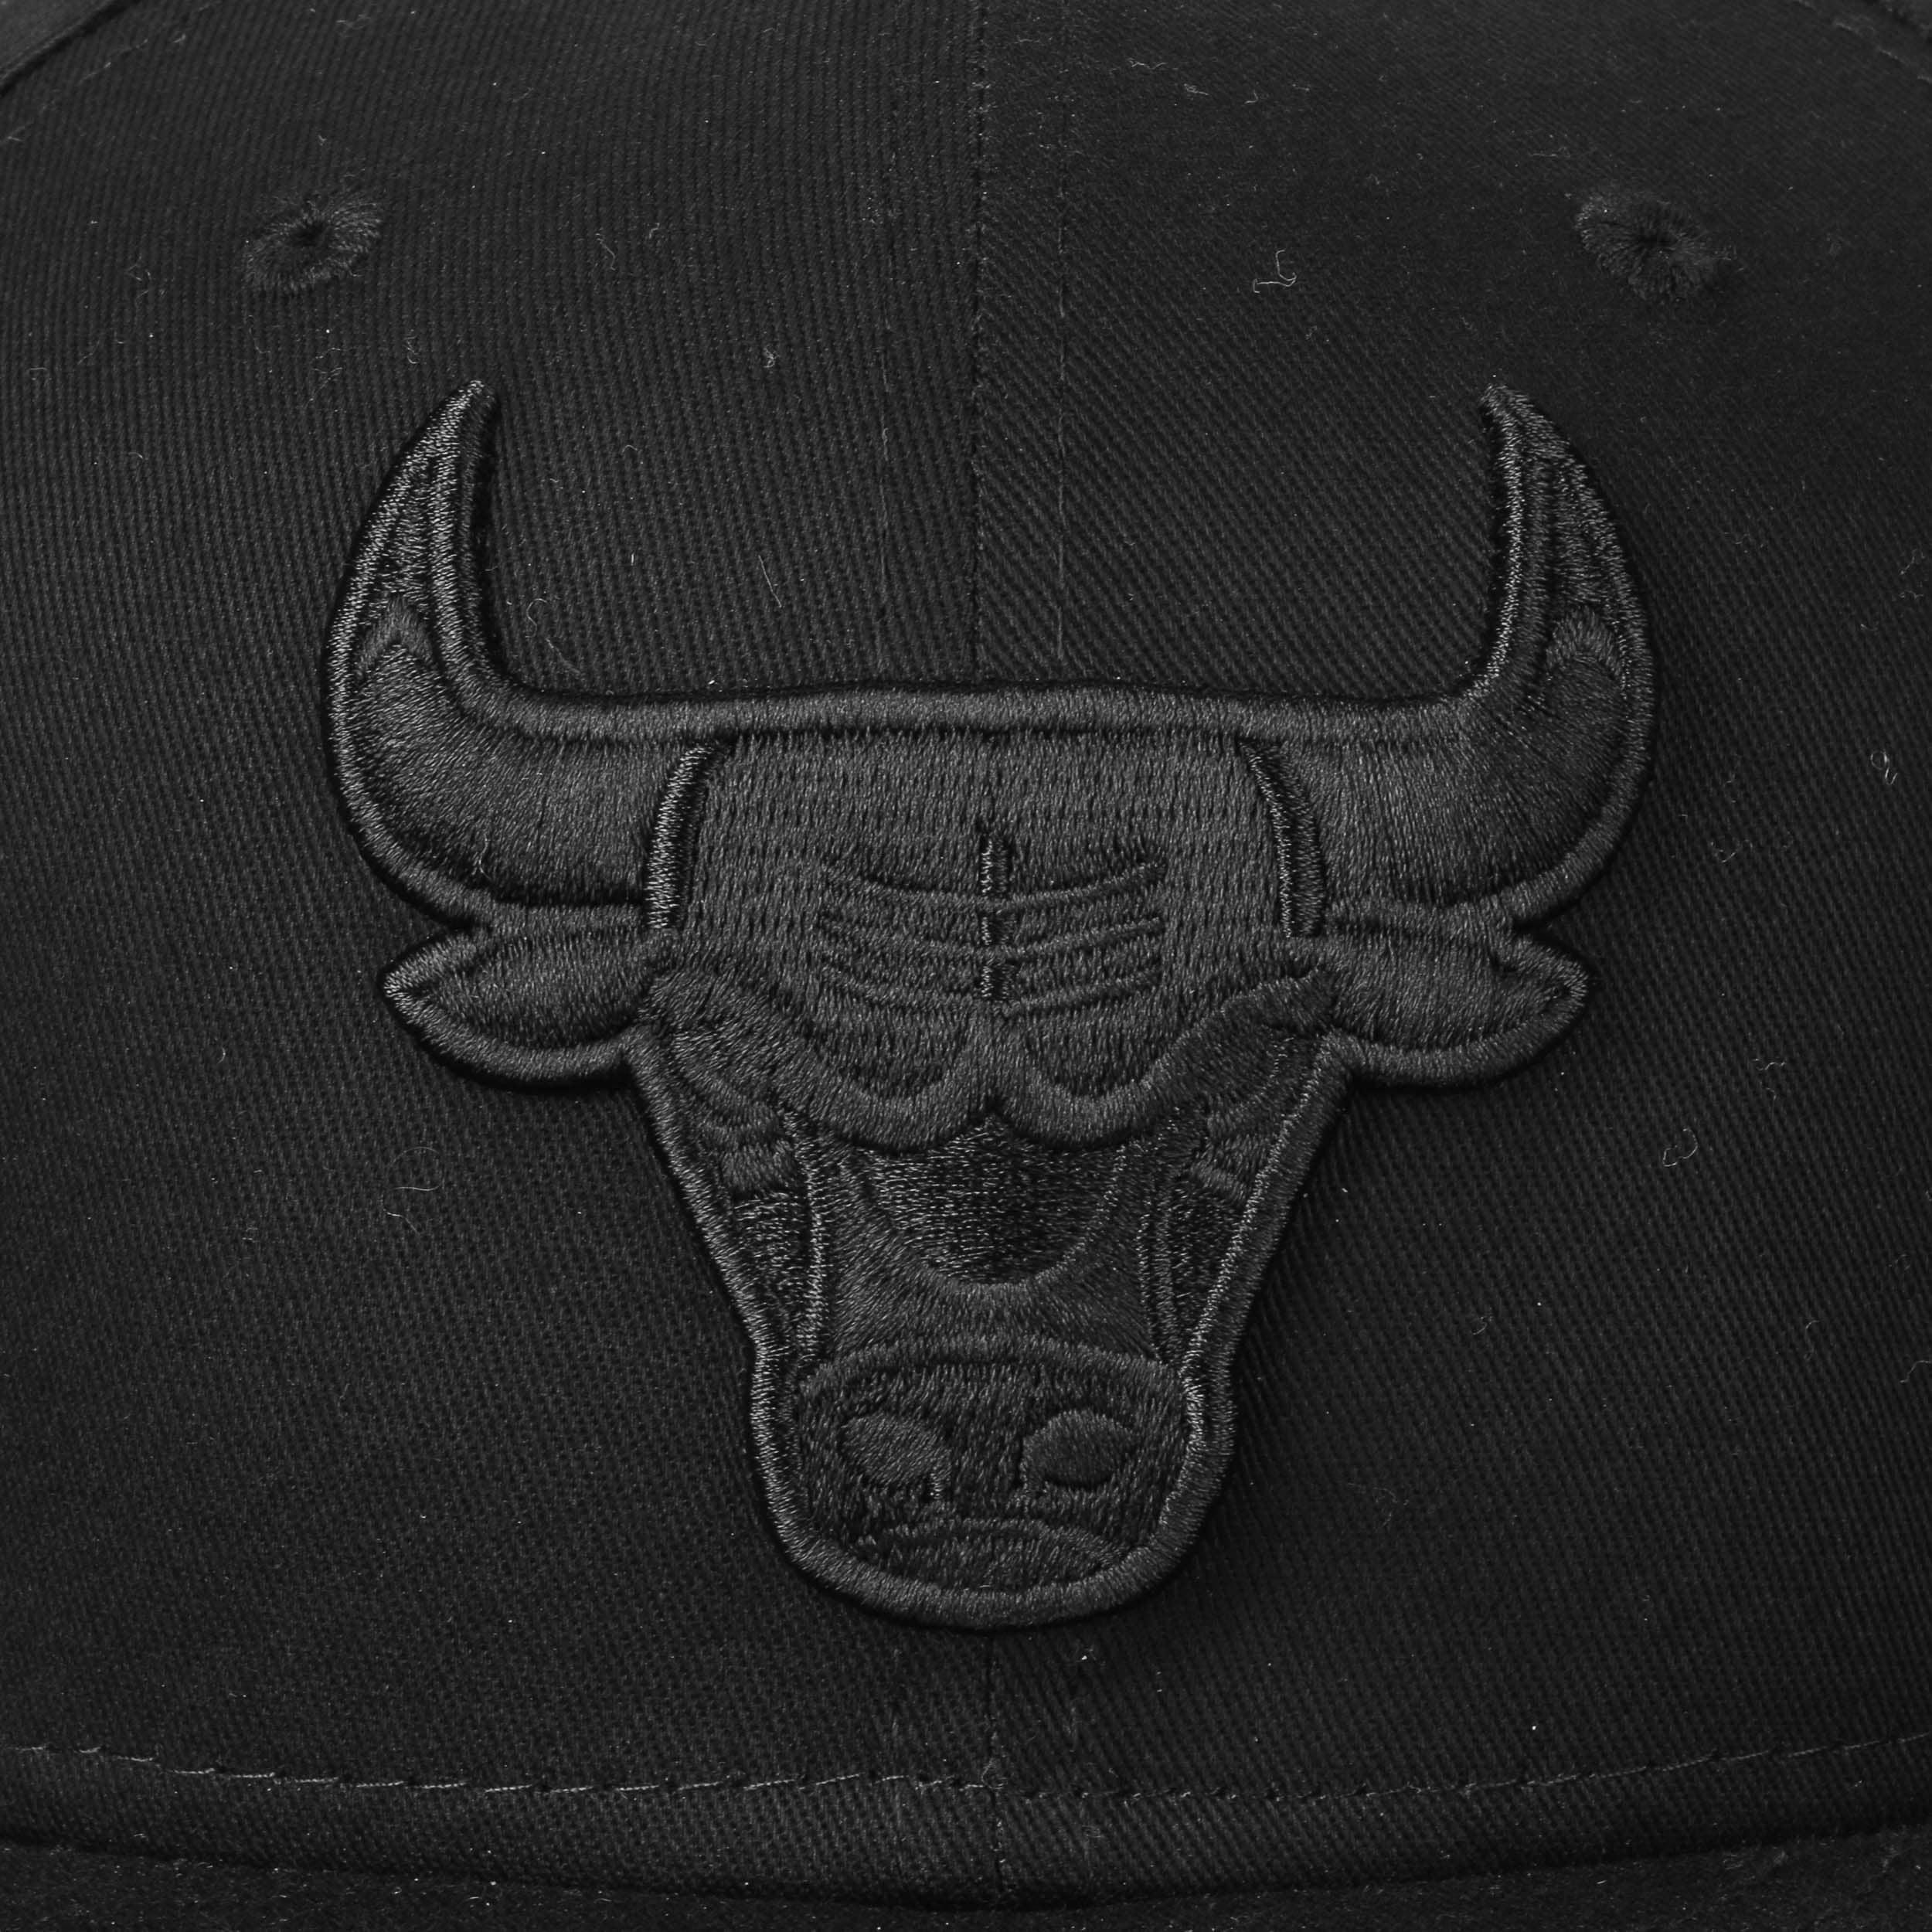 Gorra 9Fifty BOB Chicago Bulls by New Era - Gorras - sombreroshop.es 31c798e9359